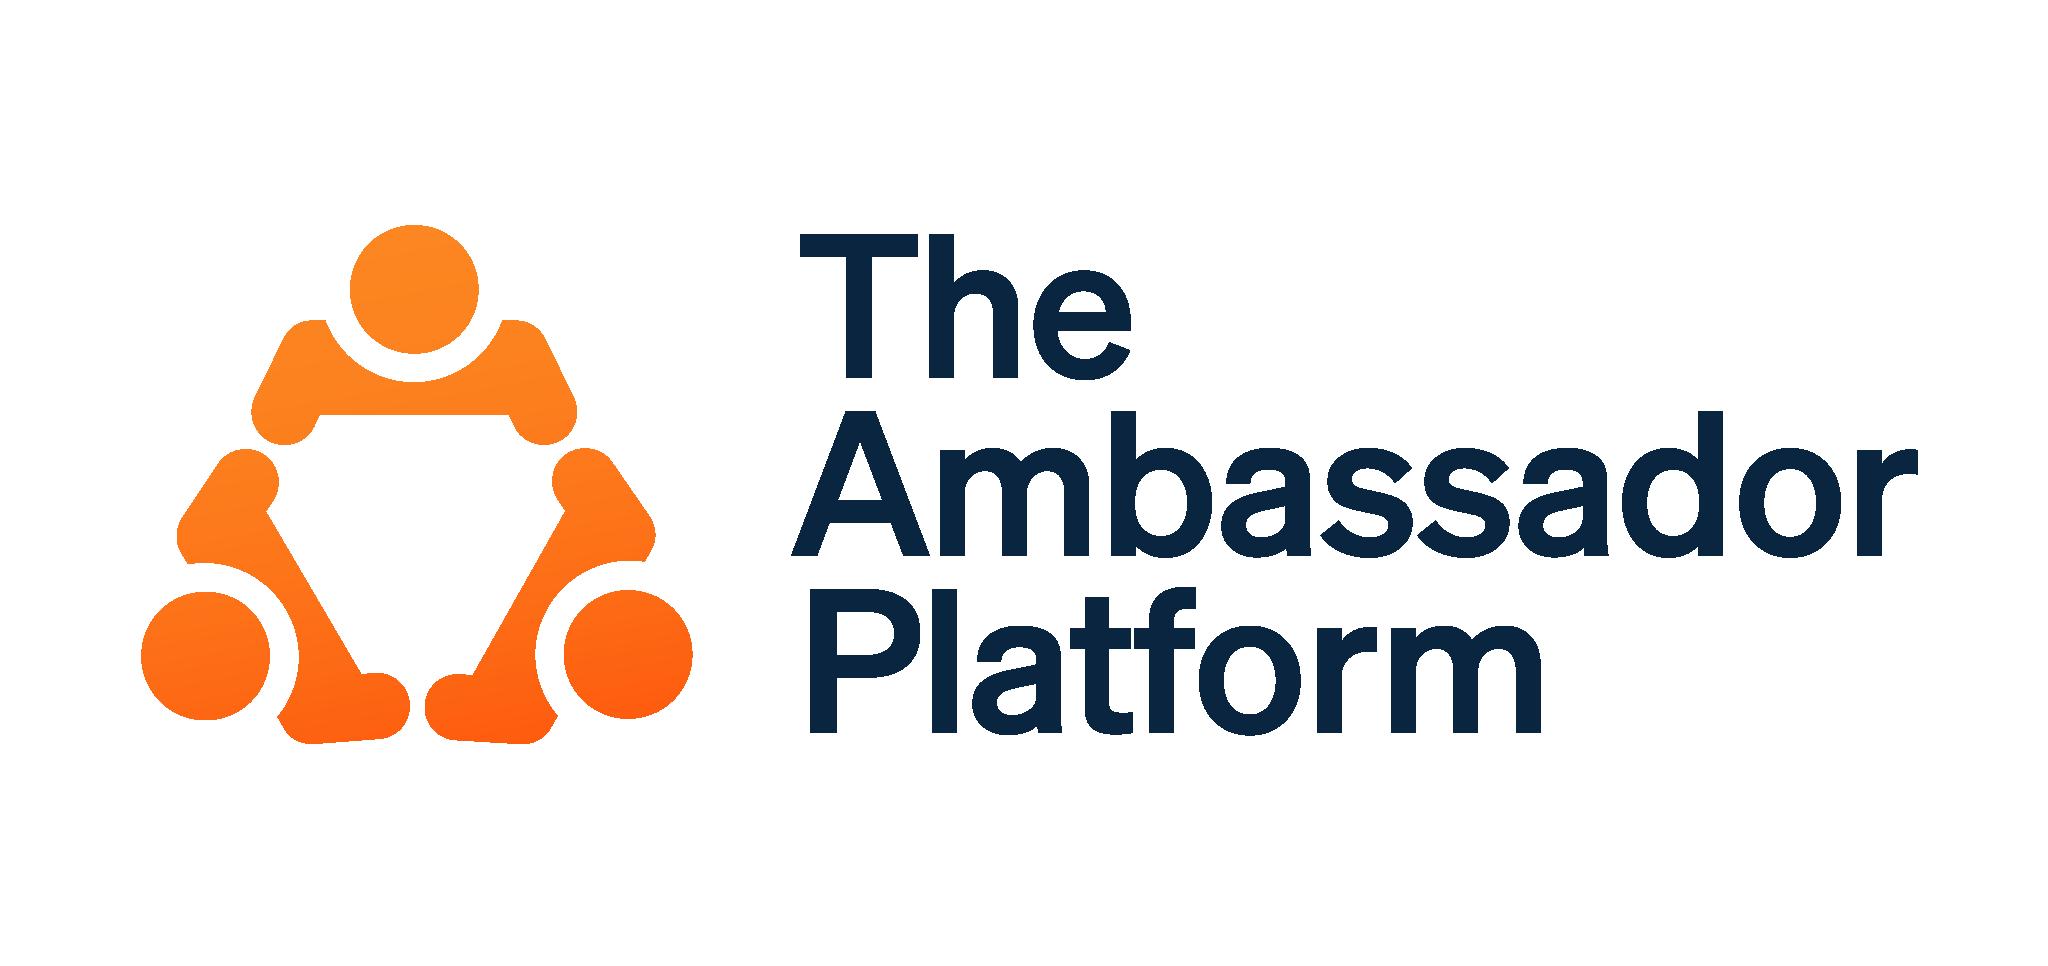 The Ambassador Platform